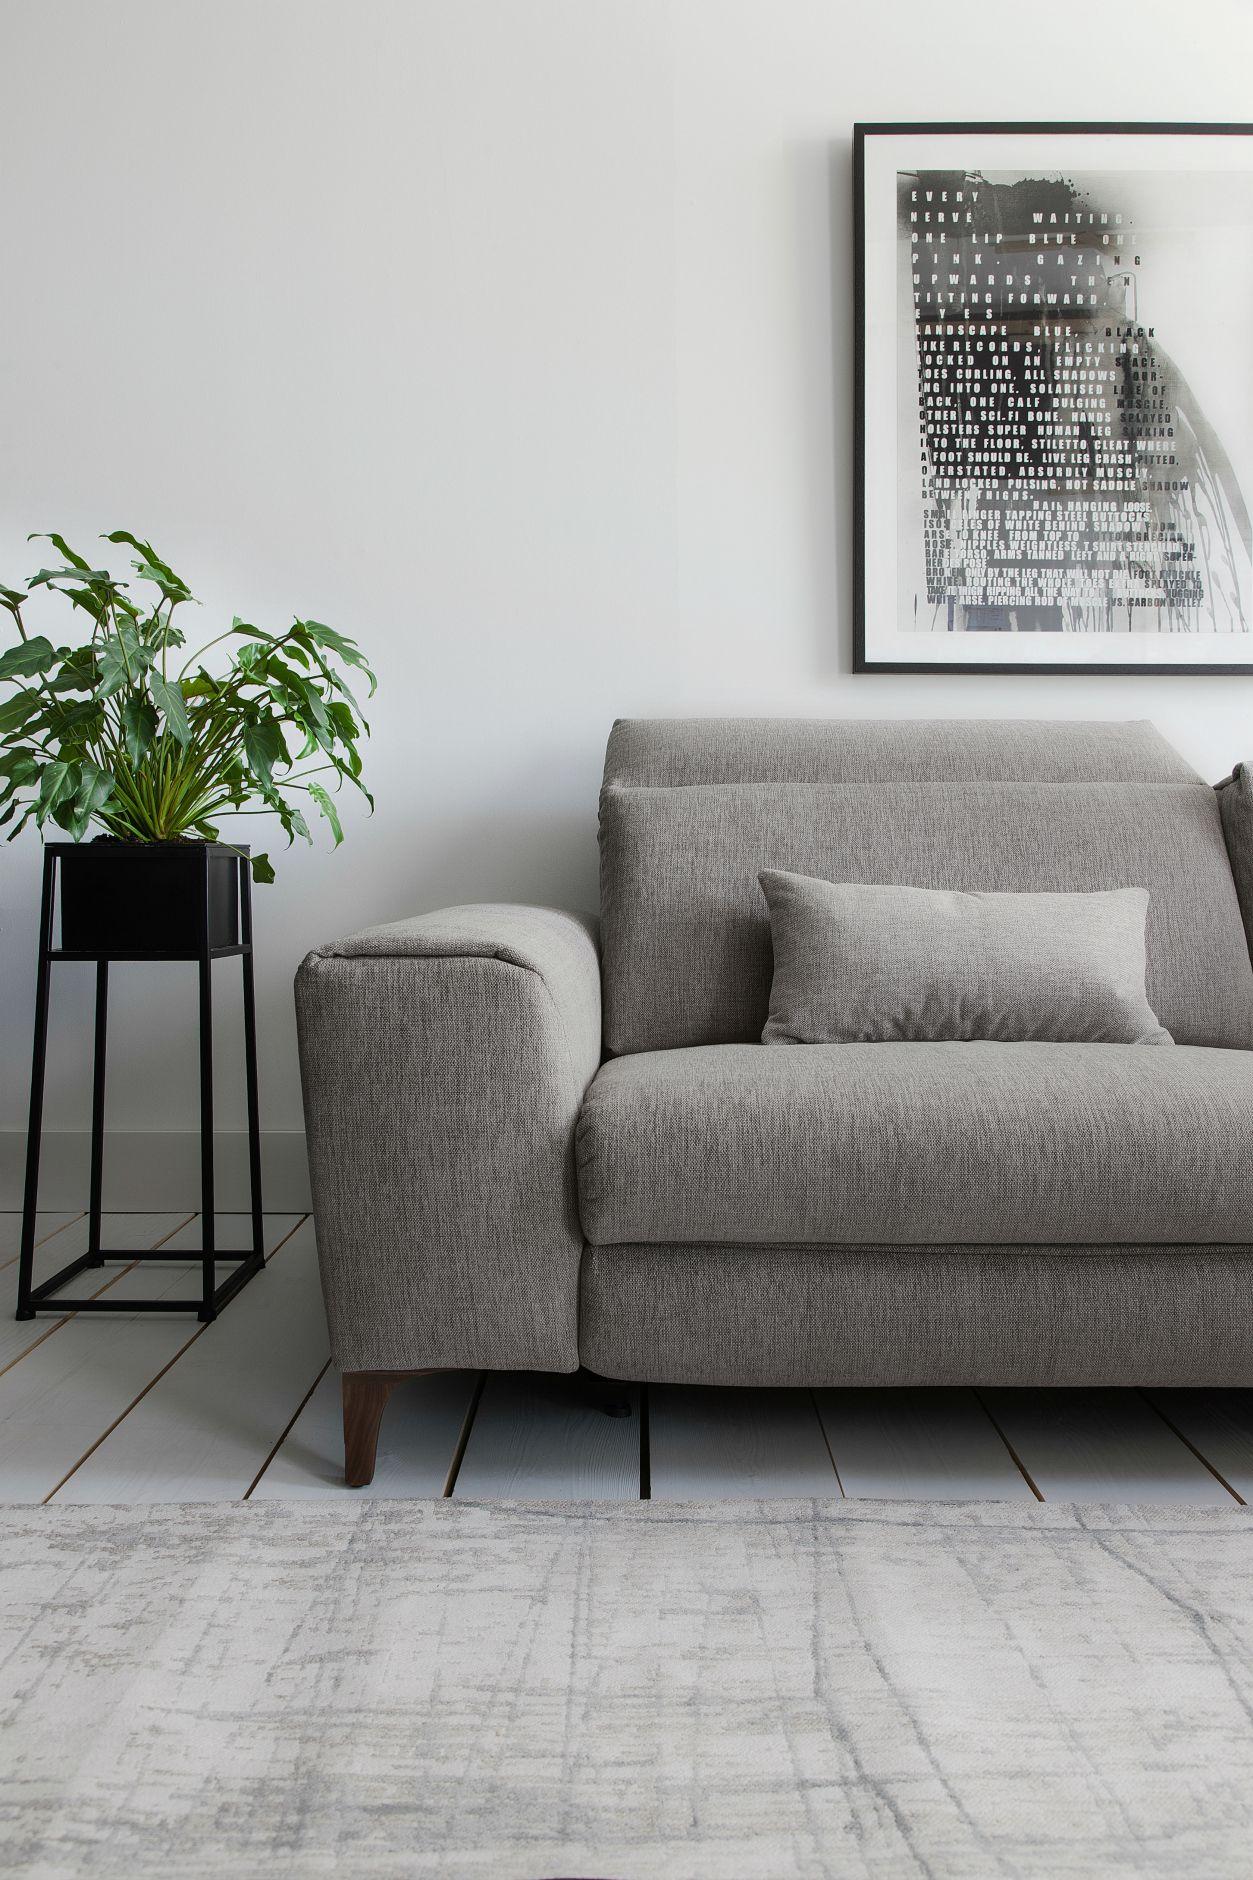 Rom Signature Range Features Custom Made Luxury Sofas In Stylish Ergonomic Designs Juliaalena